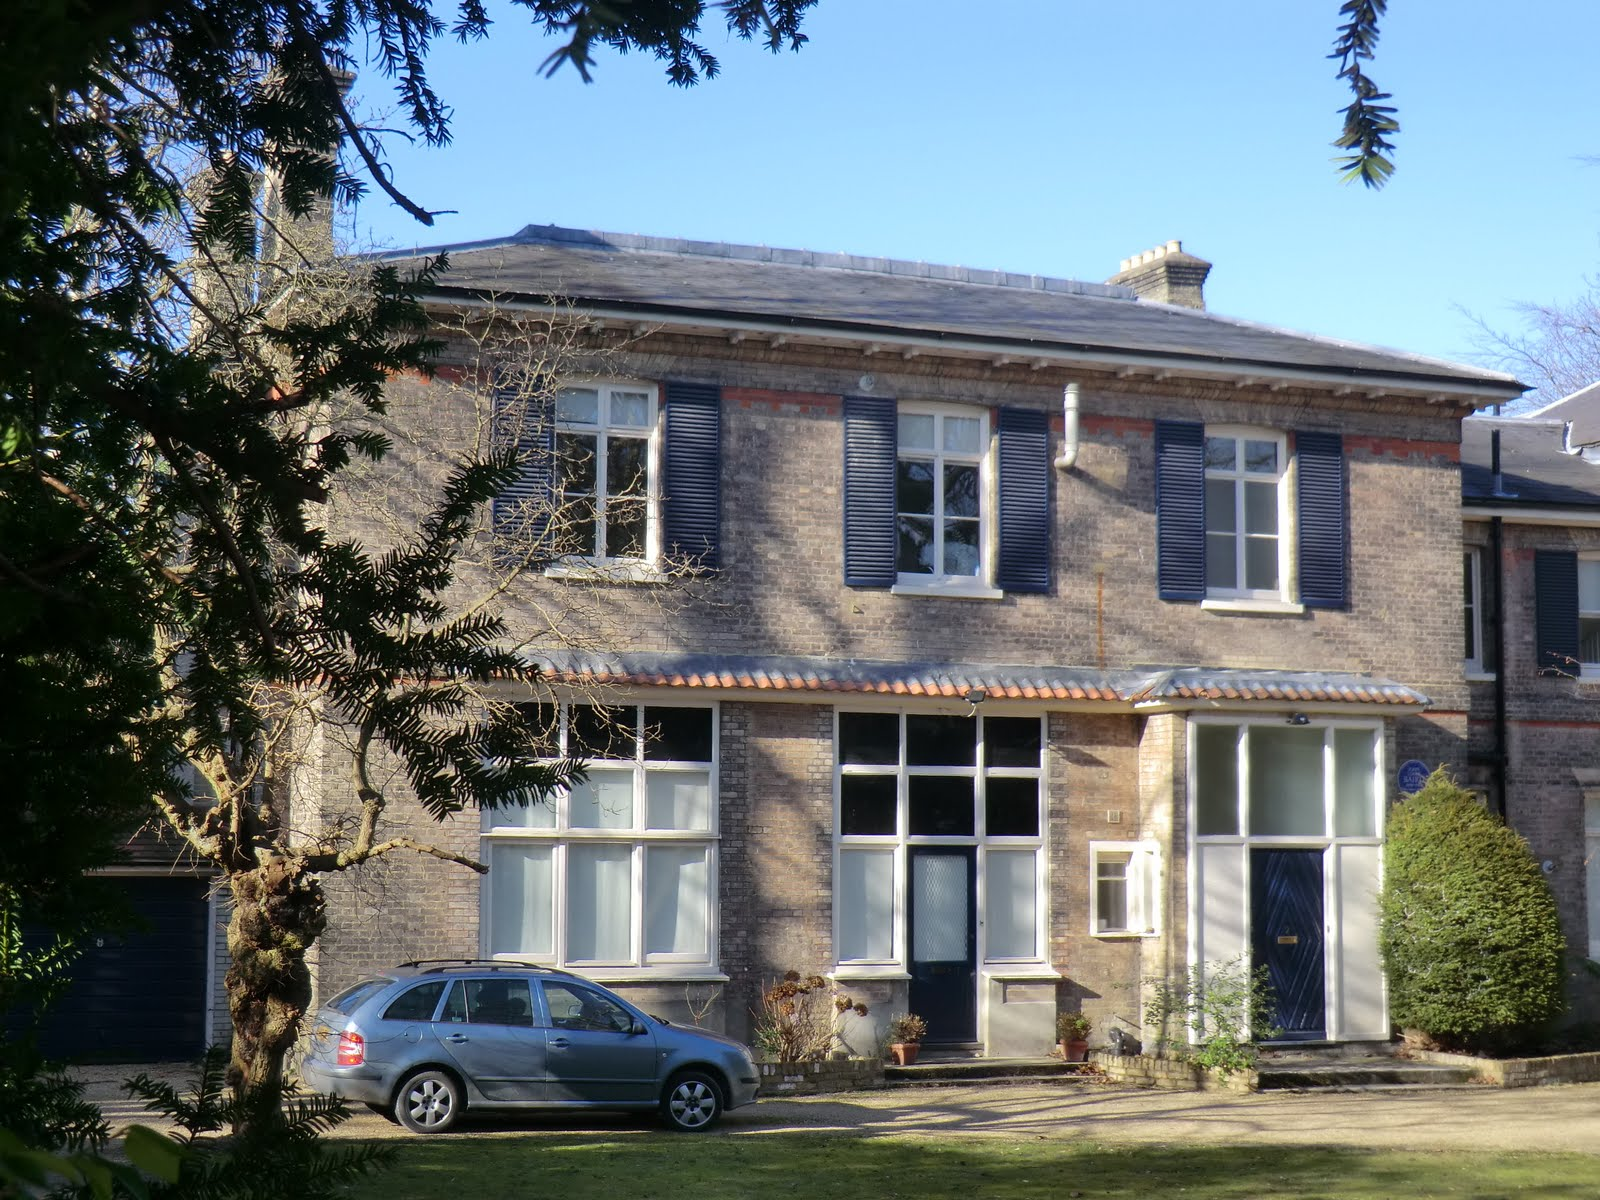 CIMG1556 John Logie Baird's house, Crescent Wood Road